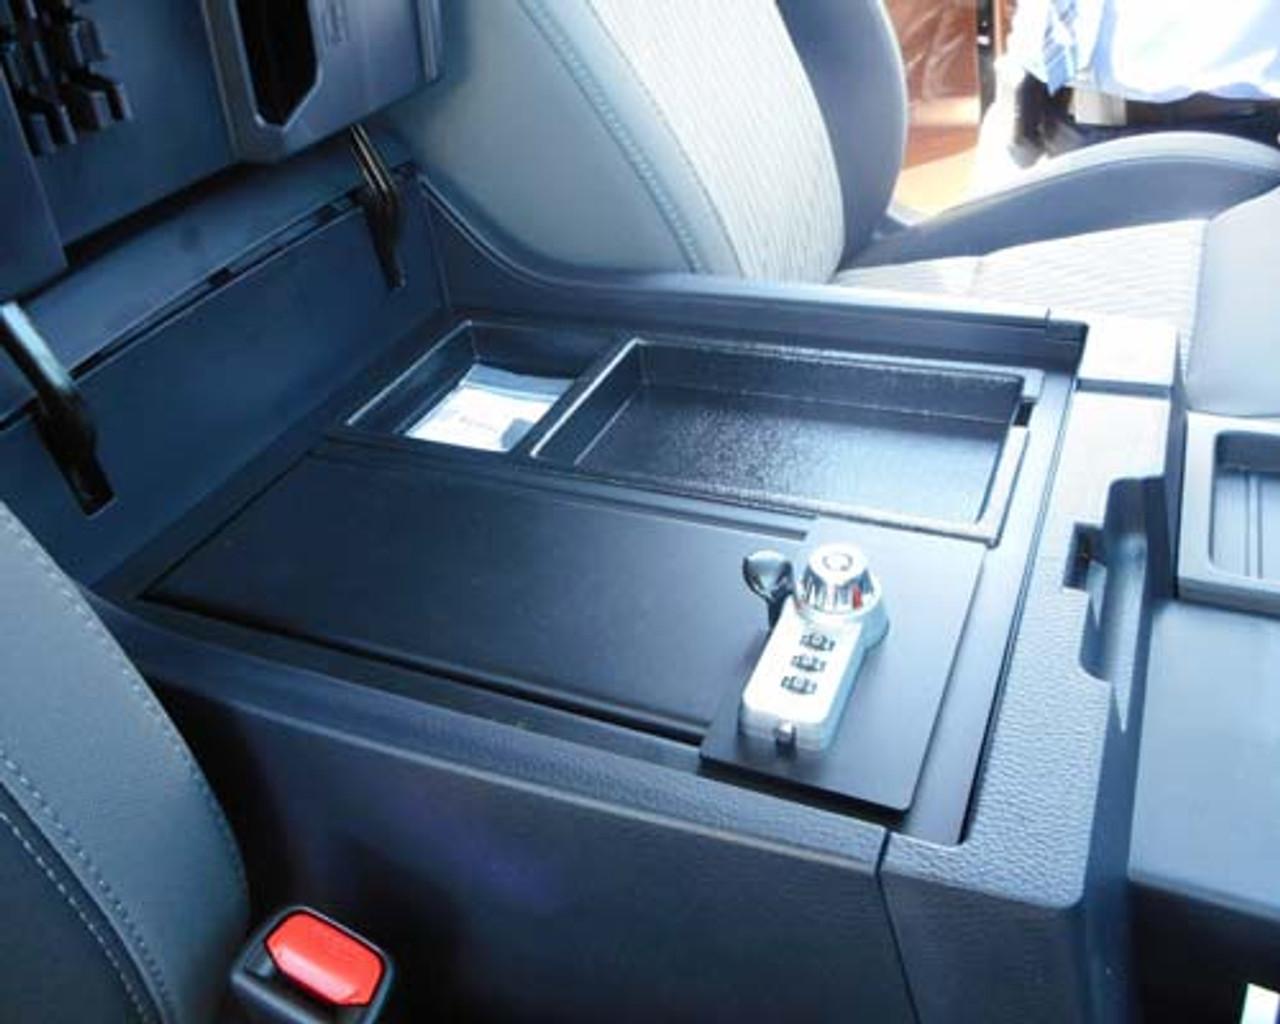 Toyota Tundra center console lock box (2014 - 2018)